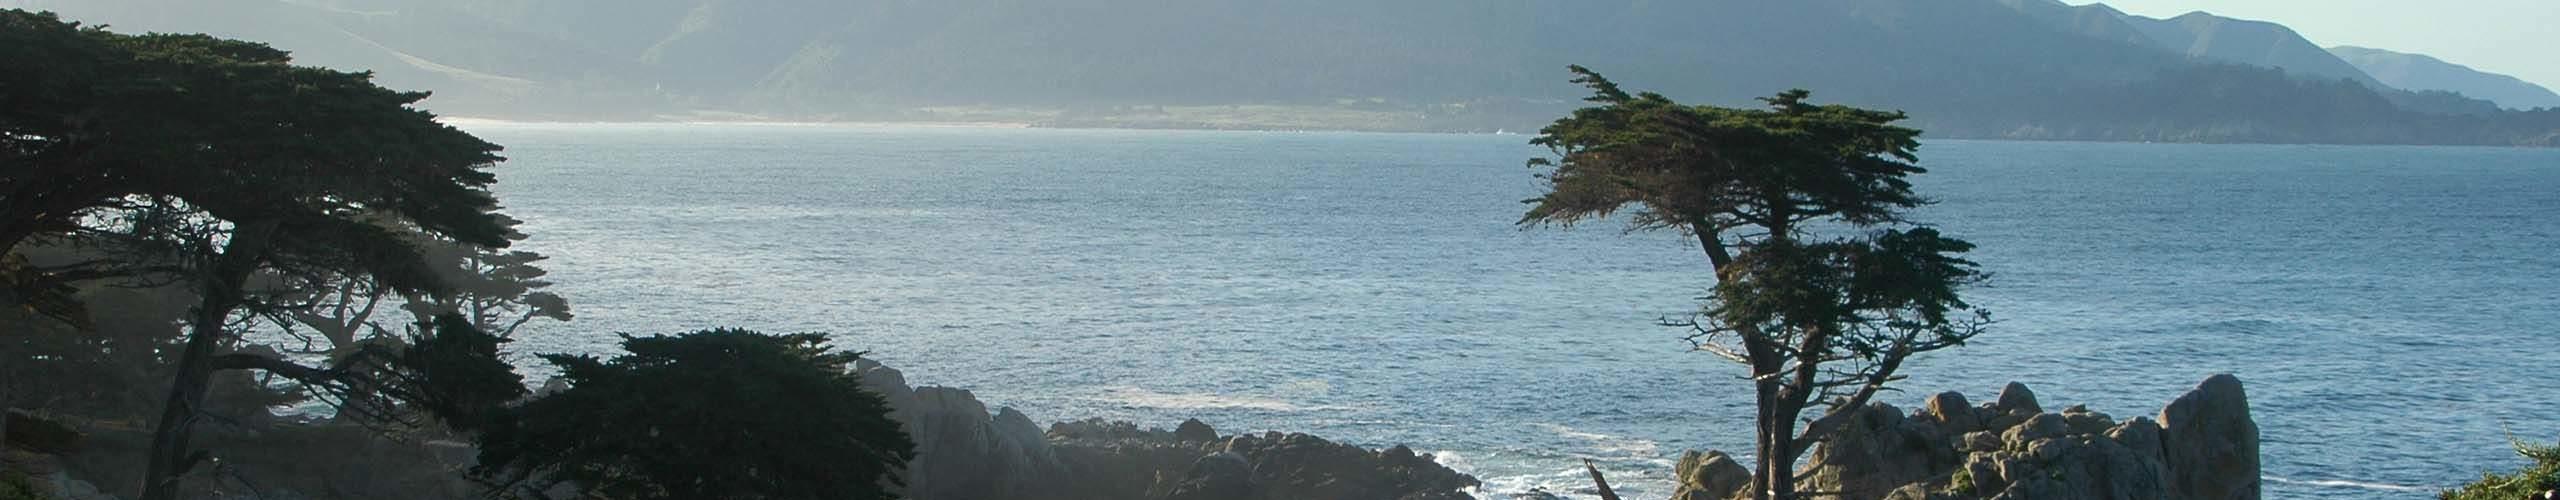 journee-randonees-panorama-baleines-touriste-monterey-featured